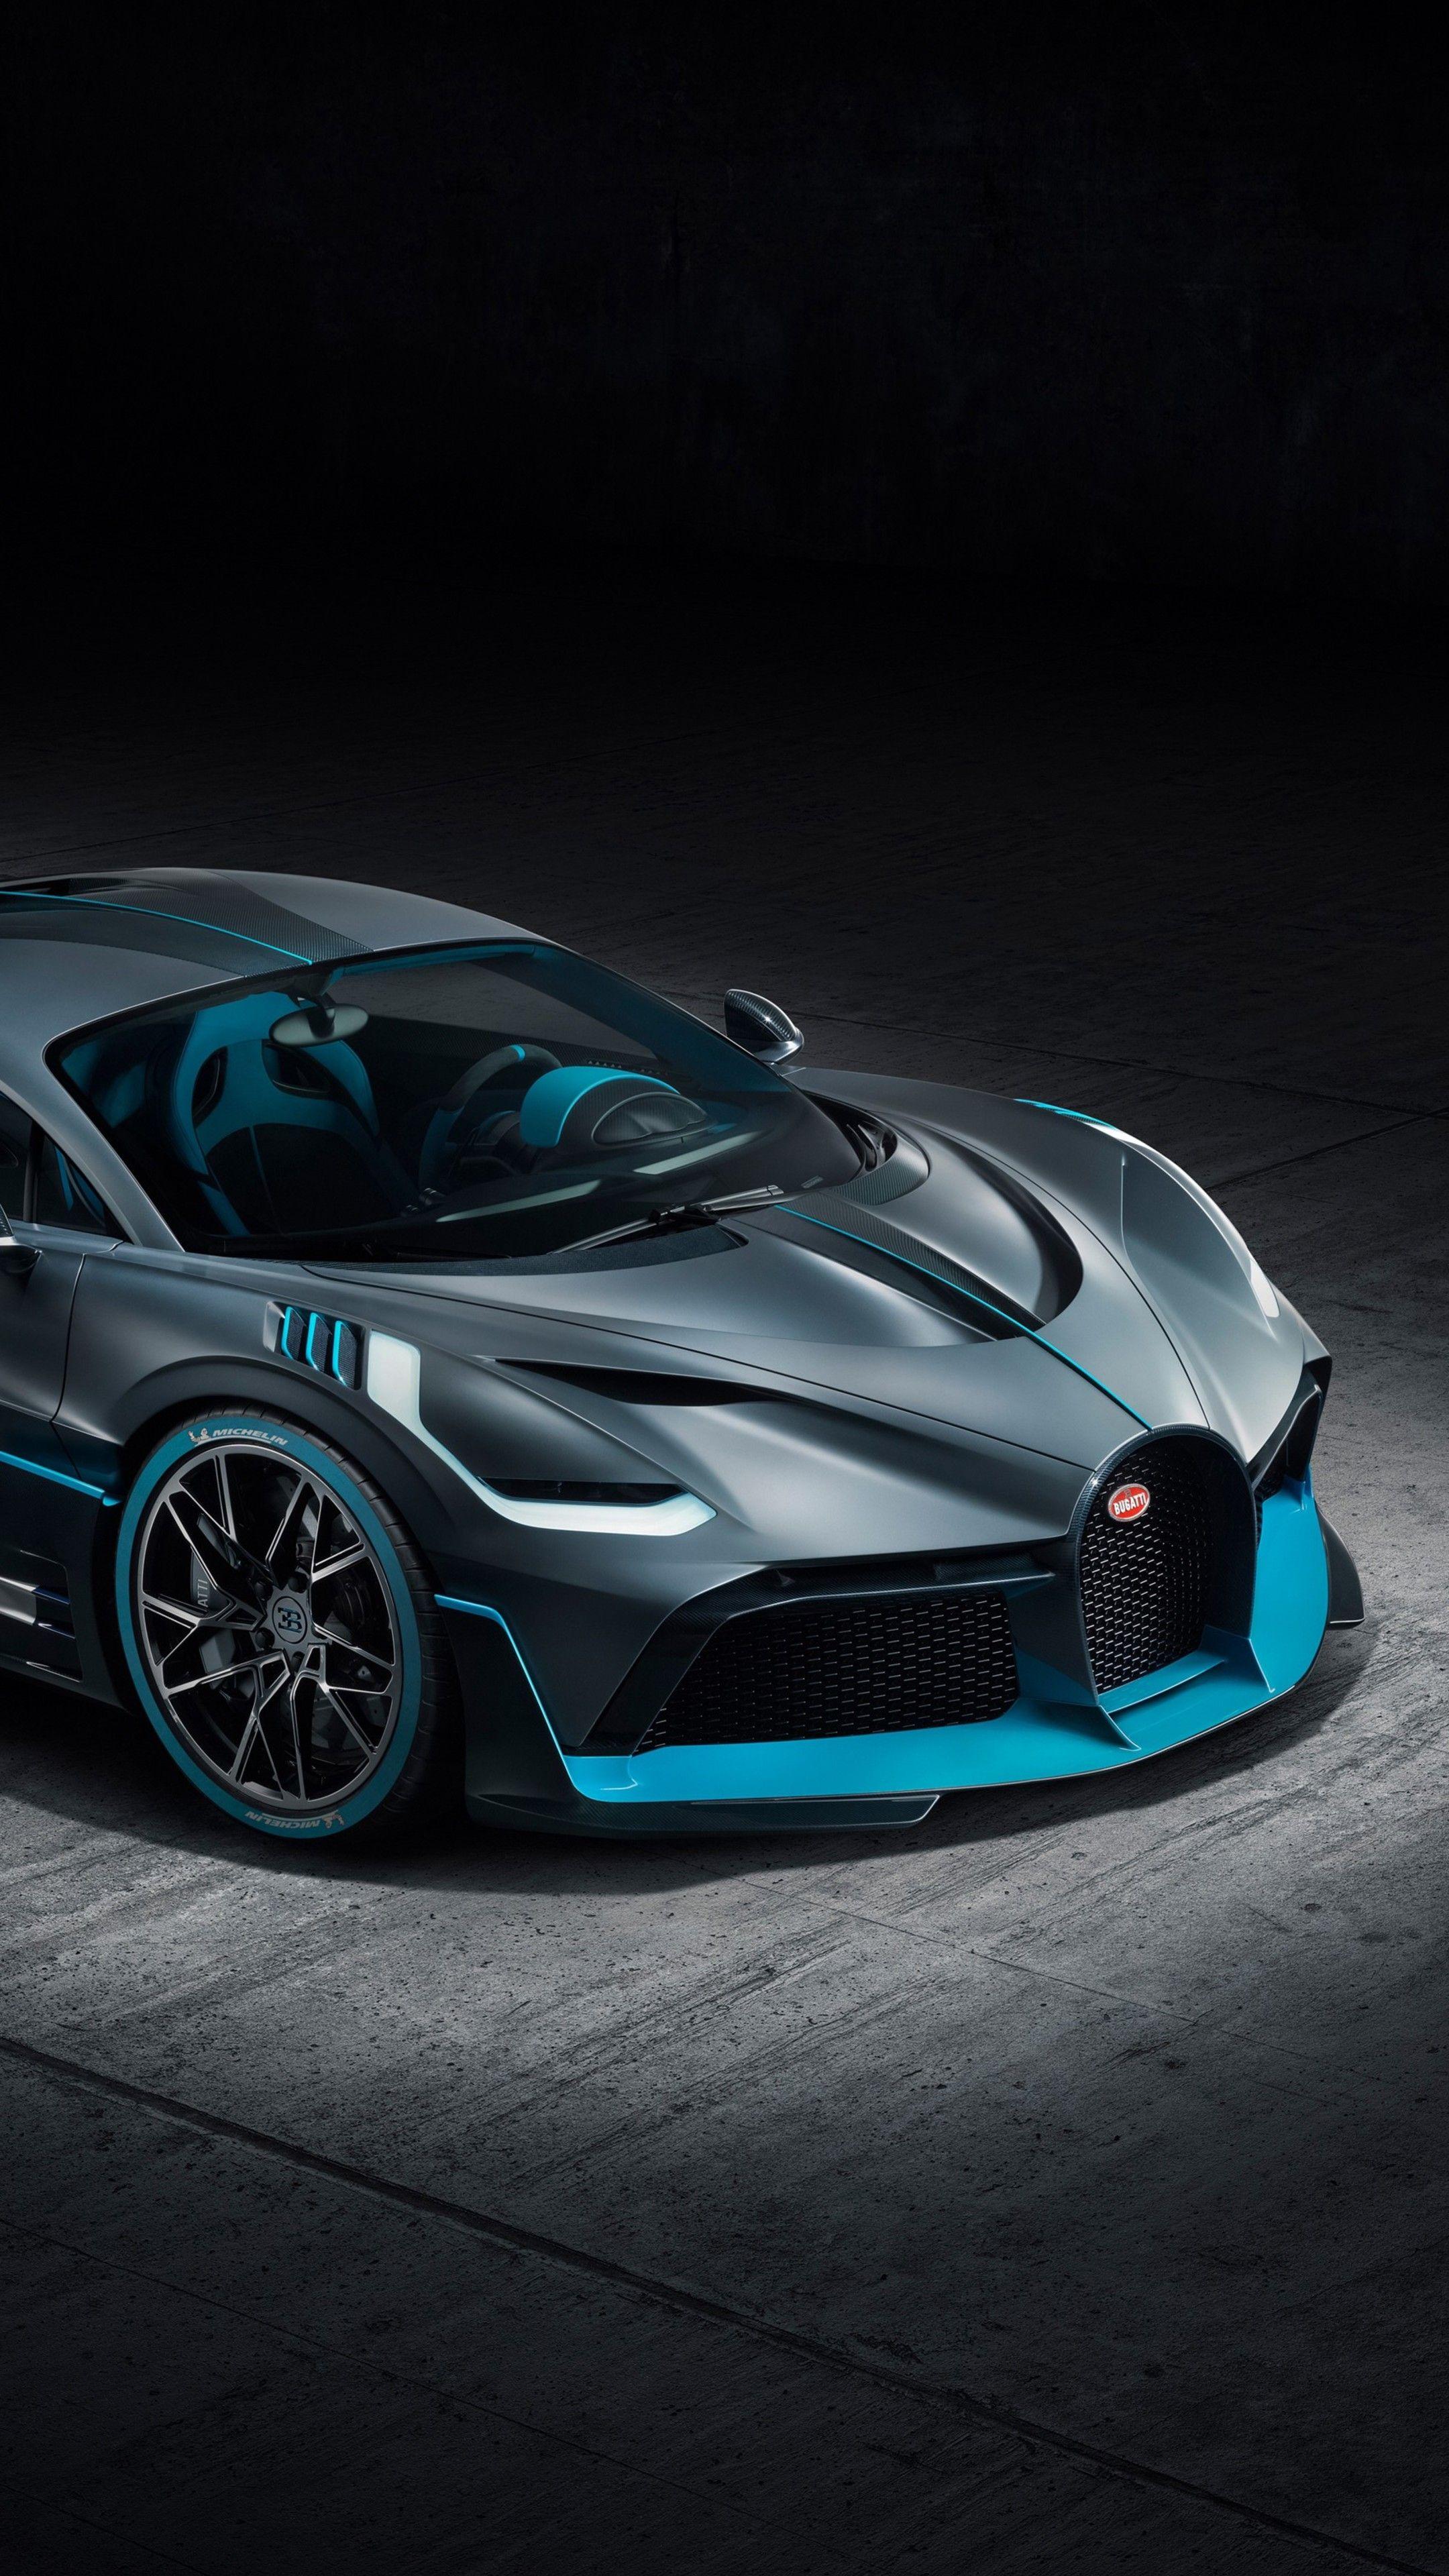 Bugatti Divo 2018 With Images Best Luxury Cars Bugatti Cars